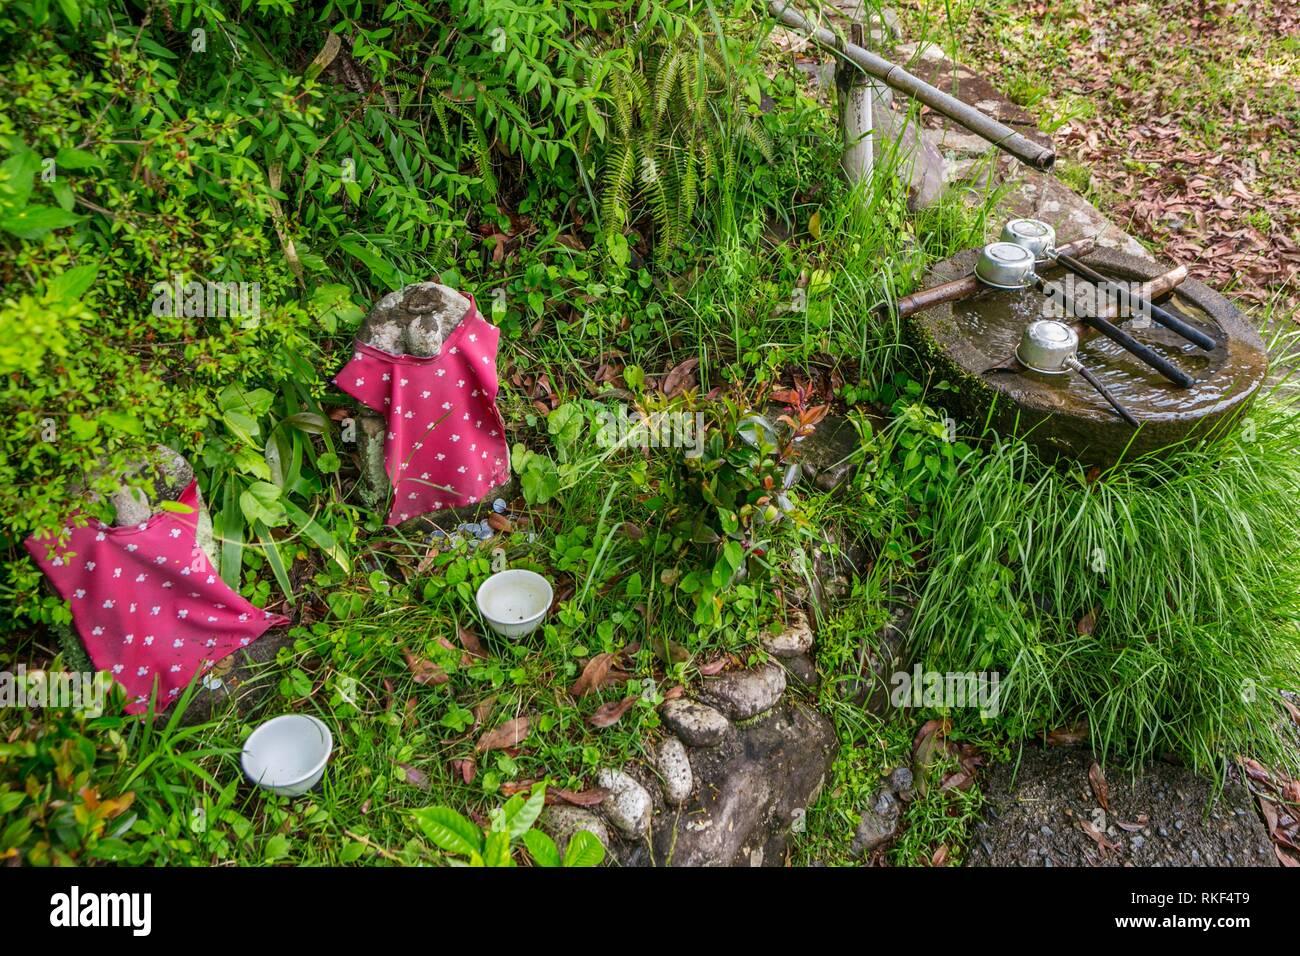 Kumano Kodo camino de santiago de compostela. Mizunomi-oji. Fuente de agua. Nakahechi. La Prefectura de Wakayama. La Península de Kii. Región de Kansai. Isla Honshü. UNESCO World Imagen De Stock